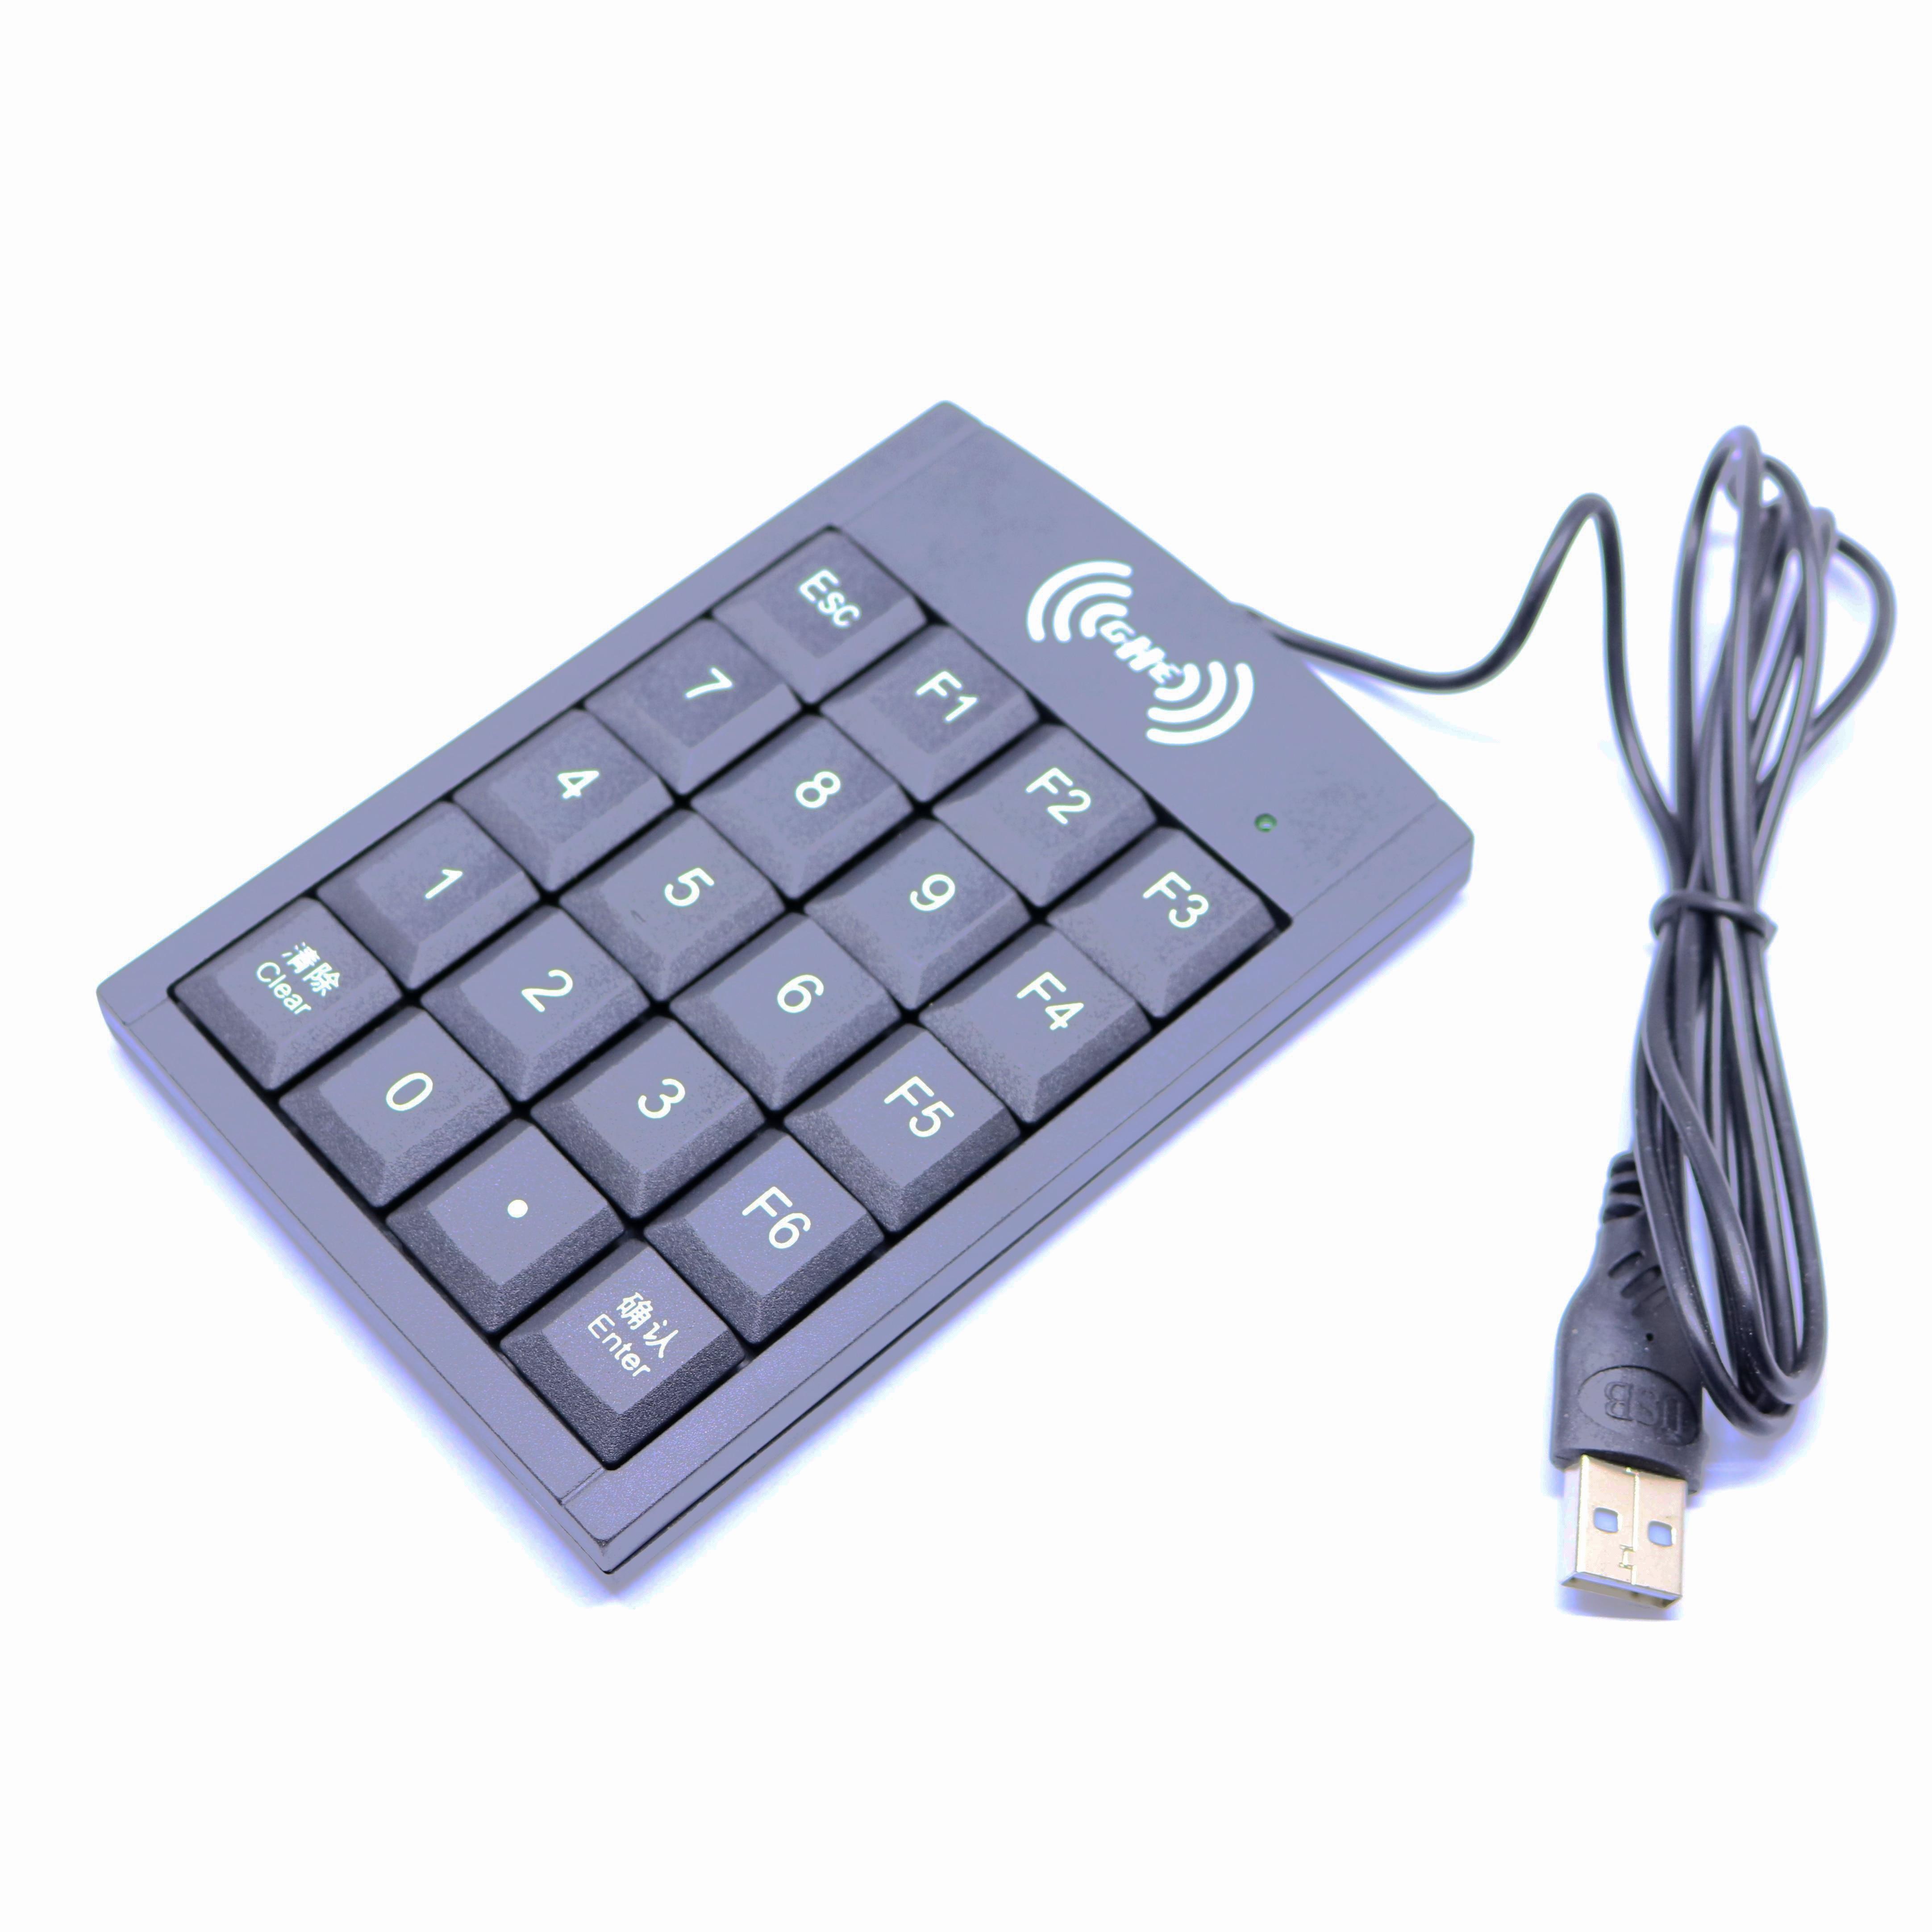 RFID 125khz USB EM Card Numeric keyboard usb pos numeric keypad card reader white